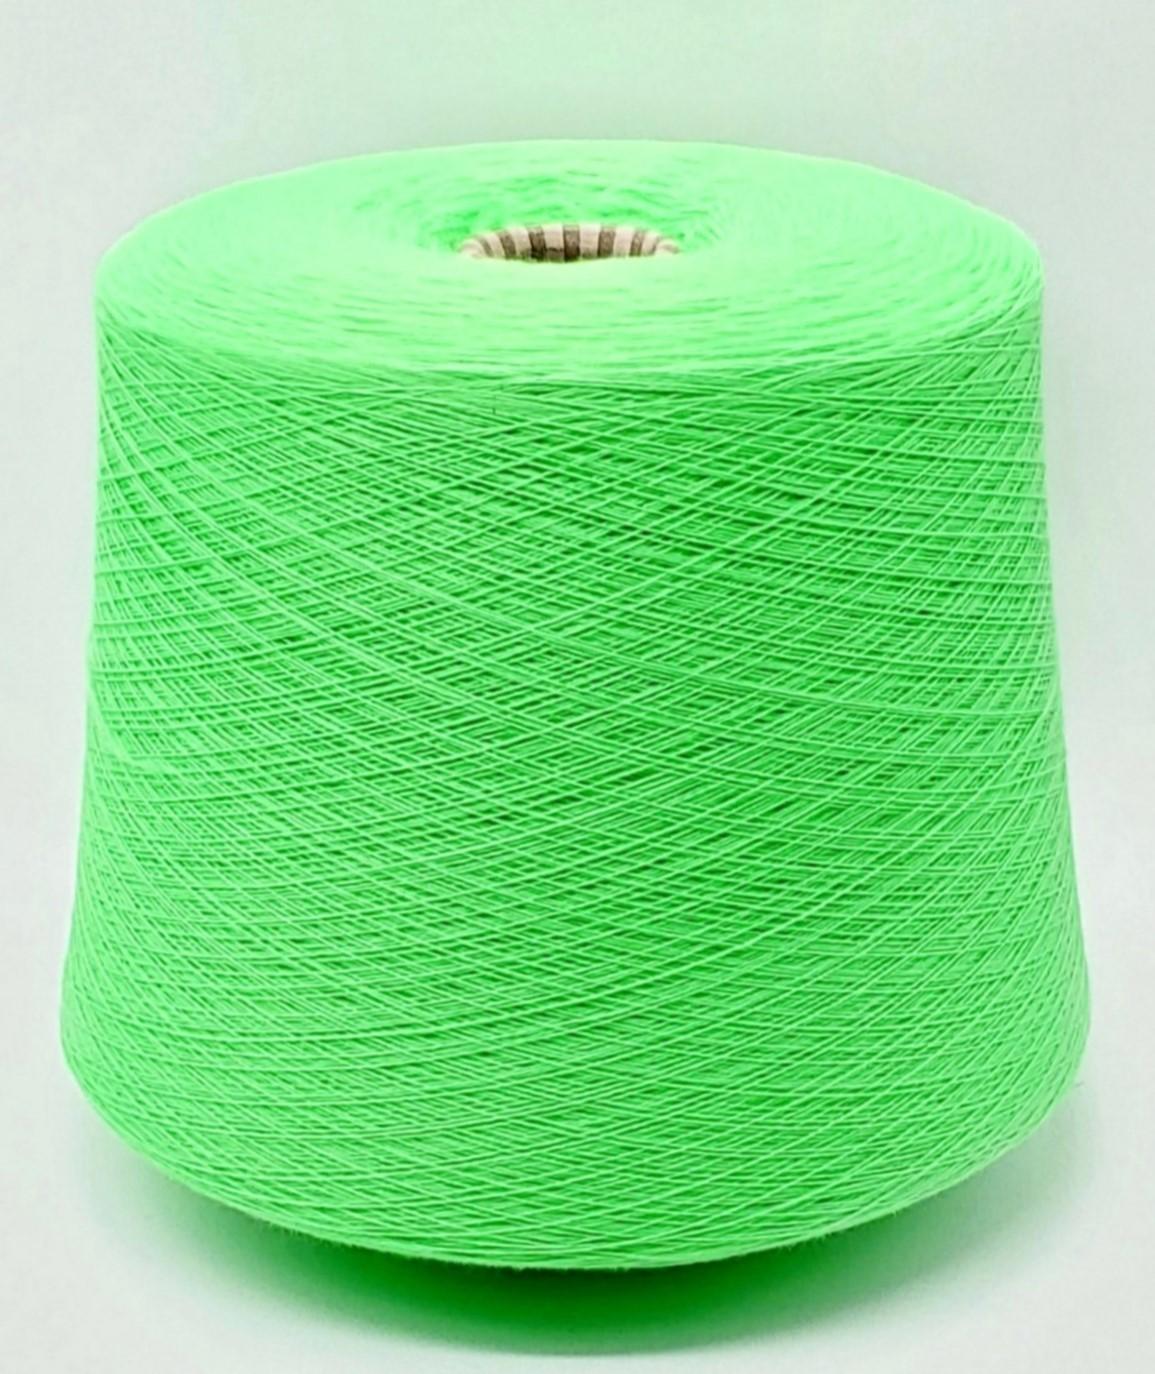 Пряжа Lana Gatto Harmony 14474 зеленый неон